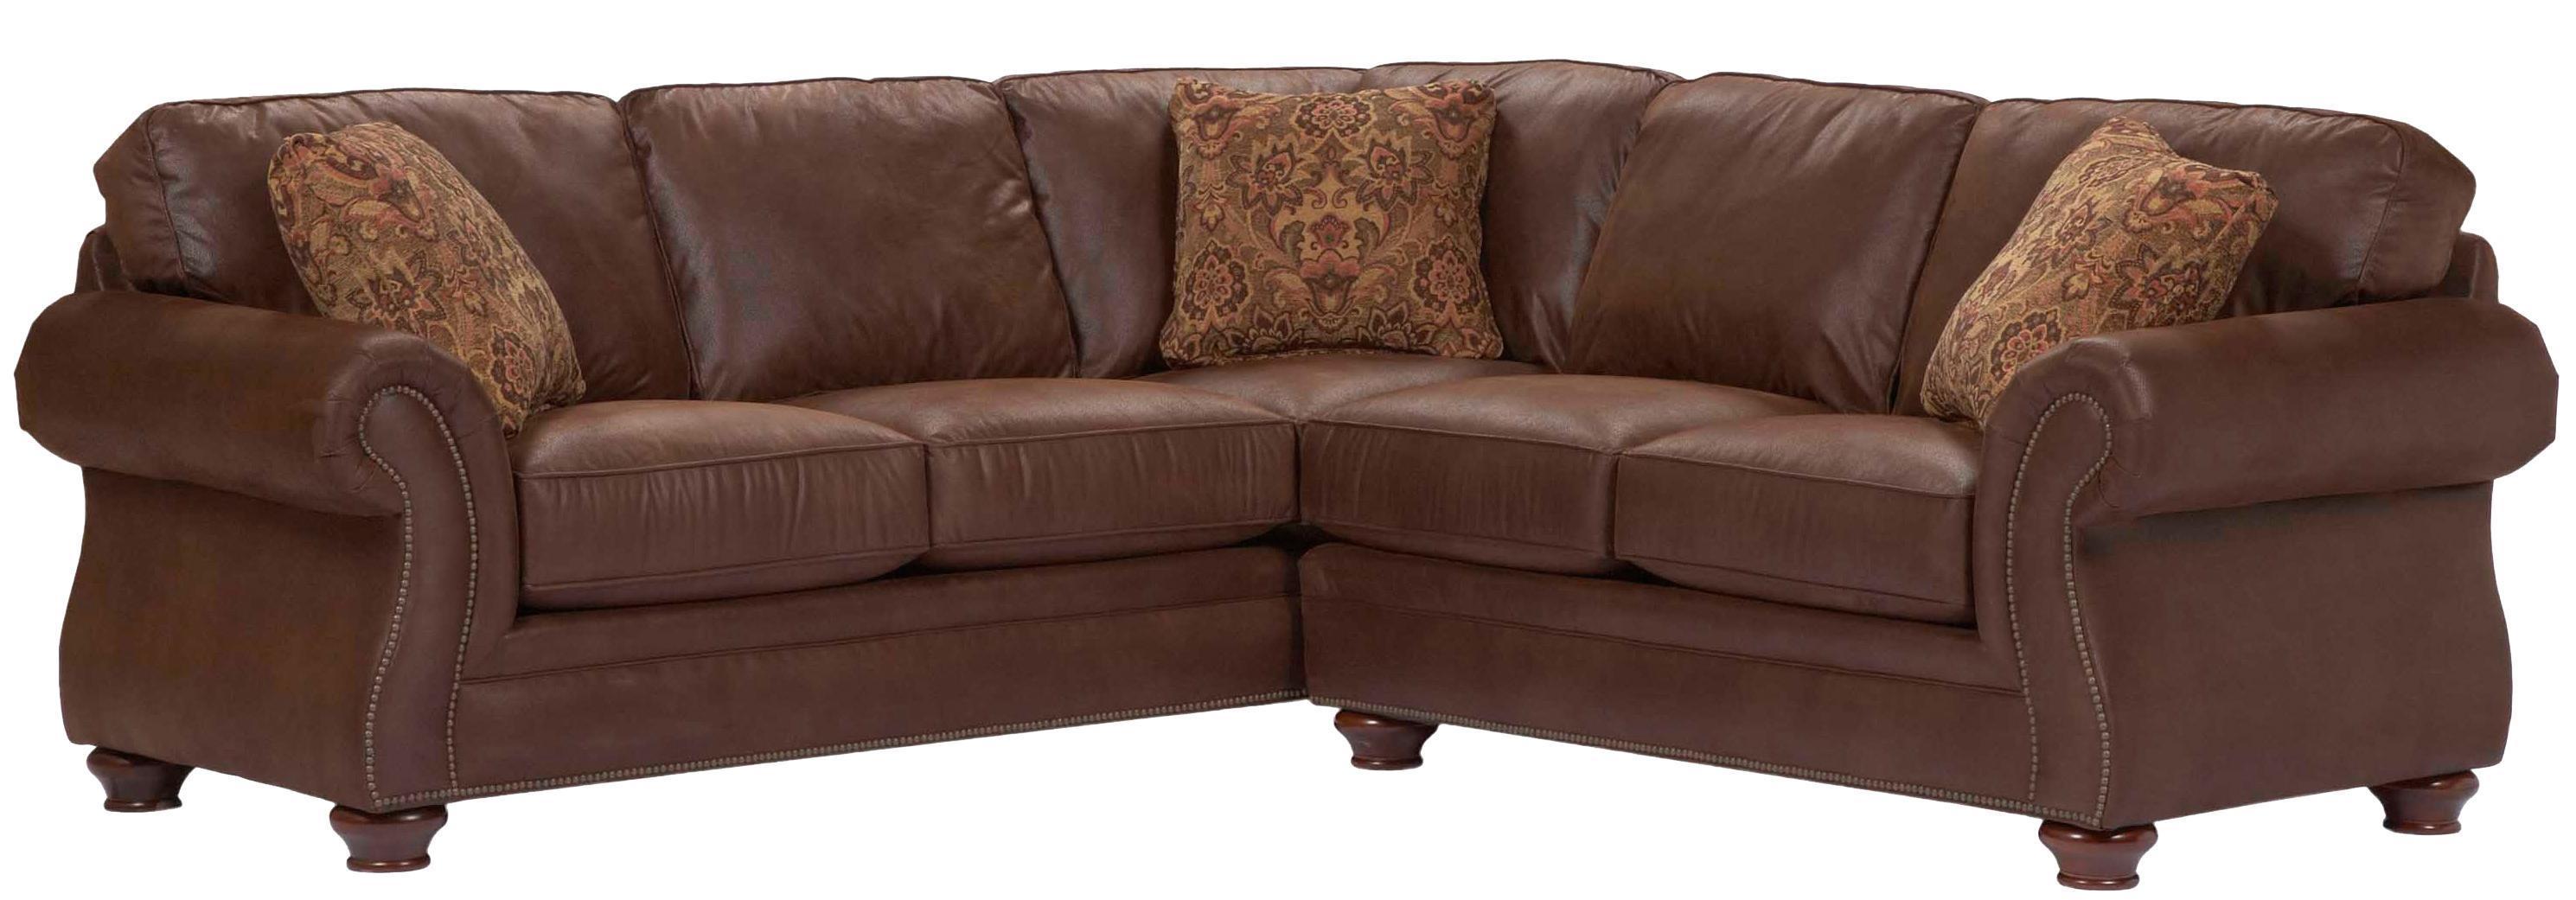 piece corner sectional sofa